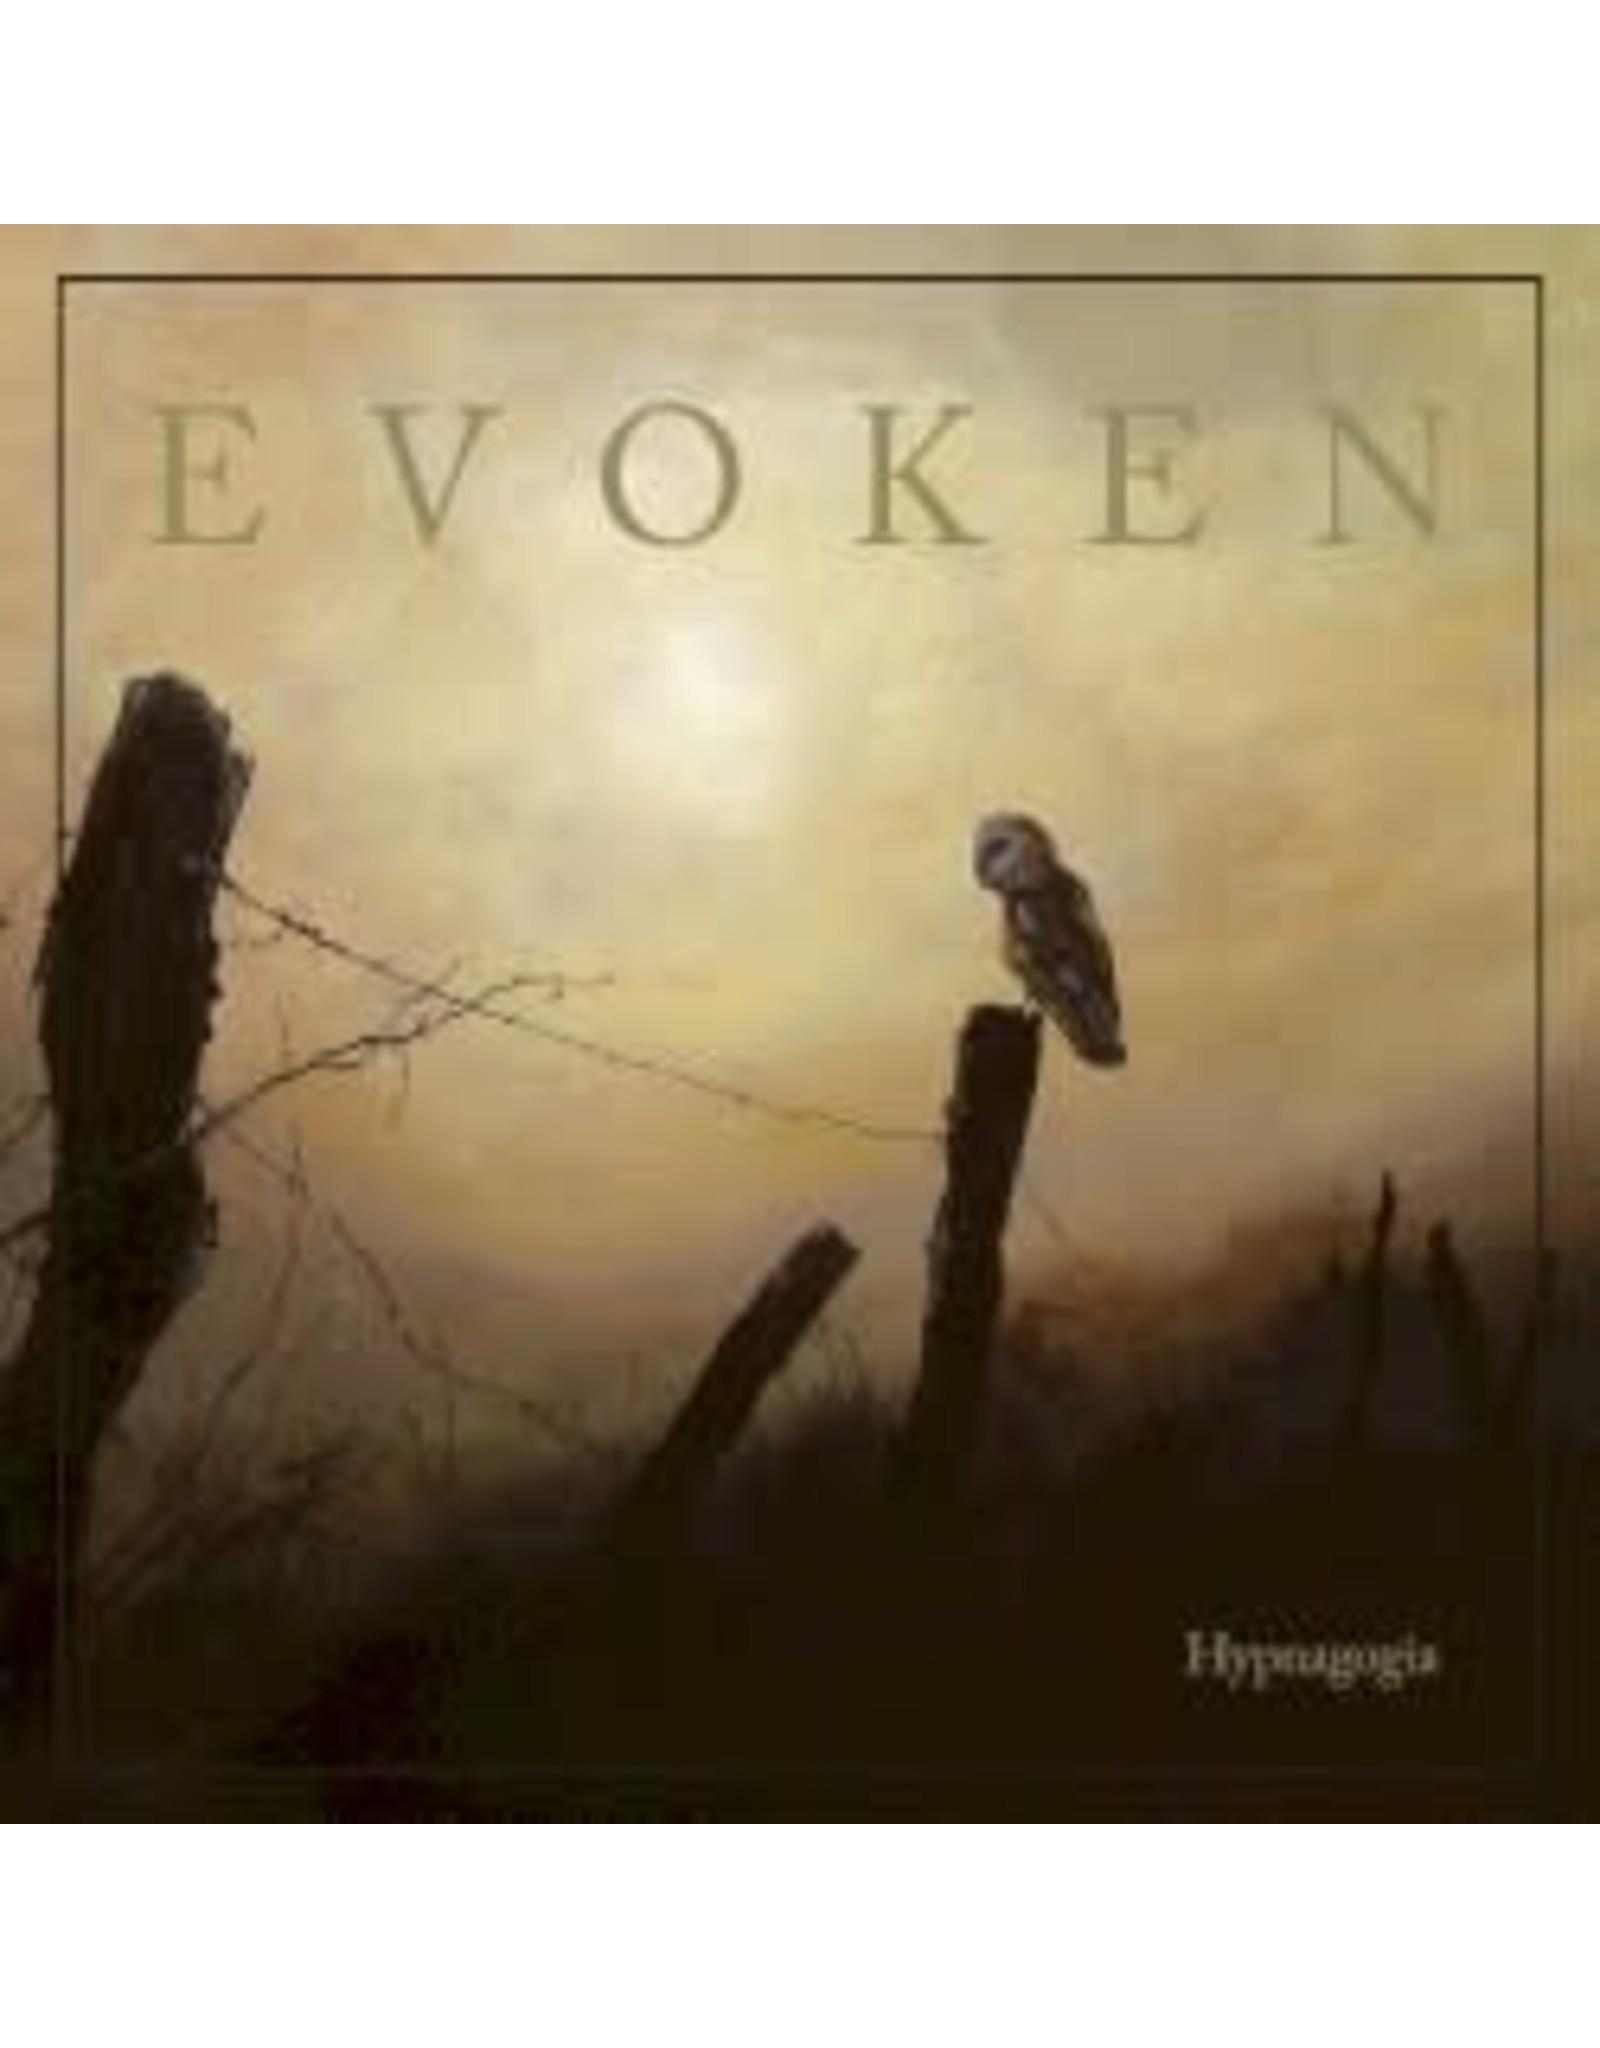 Evoken - Hypnagogia 2LP